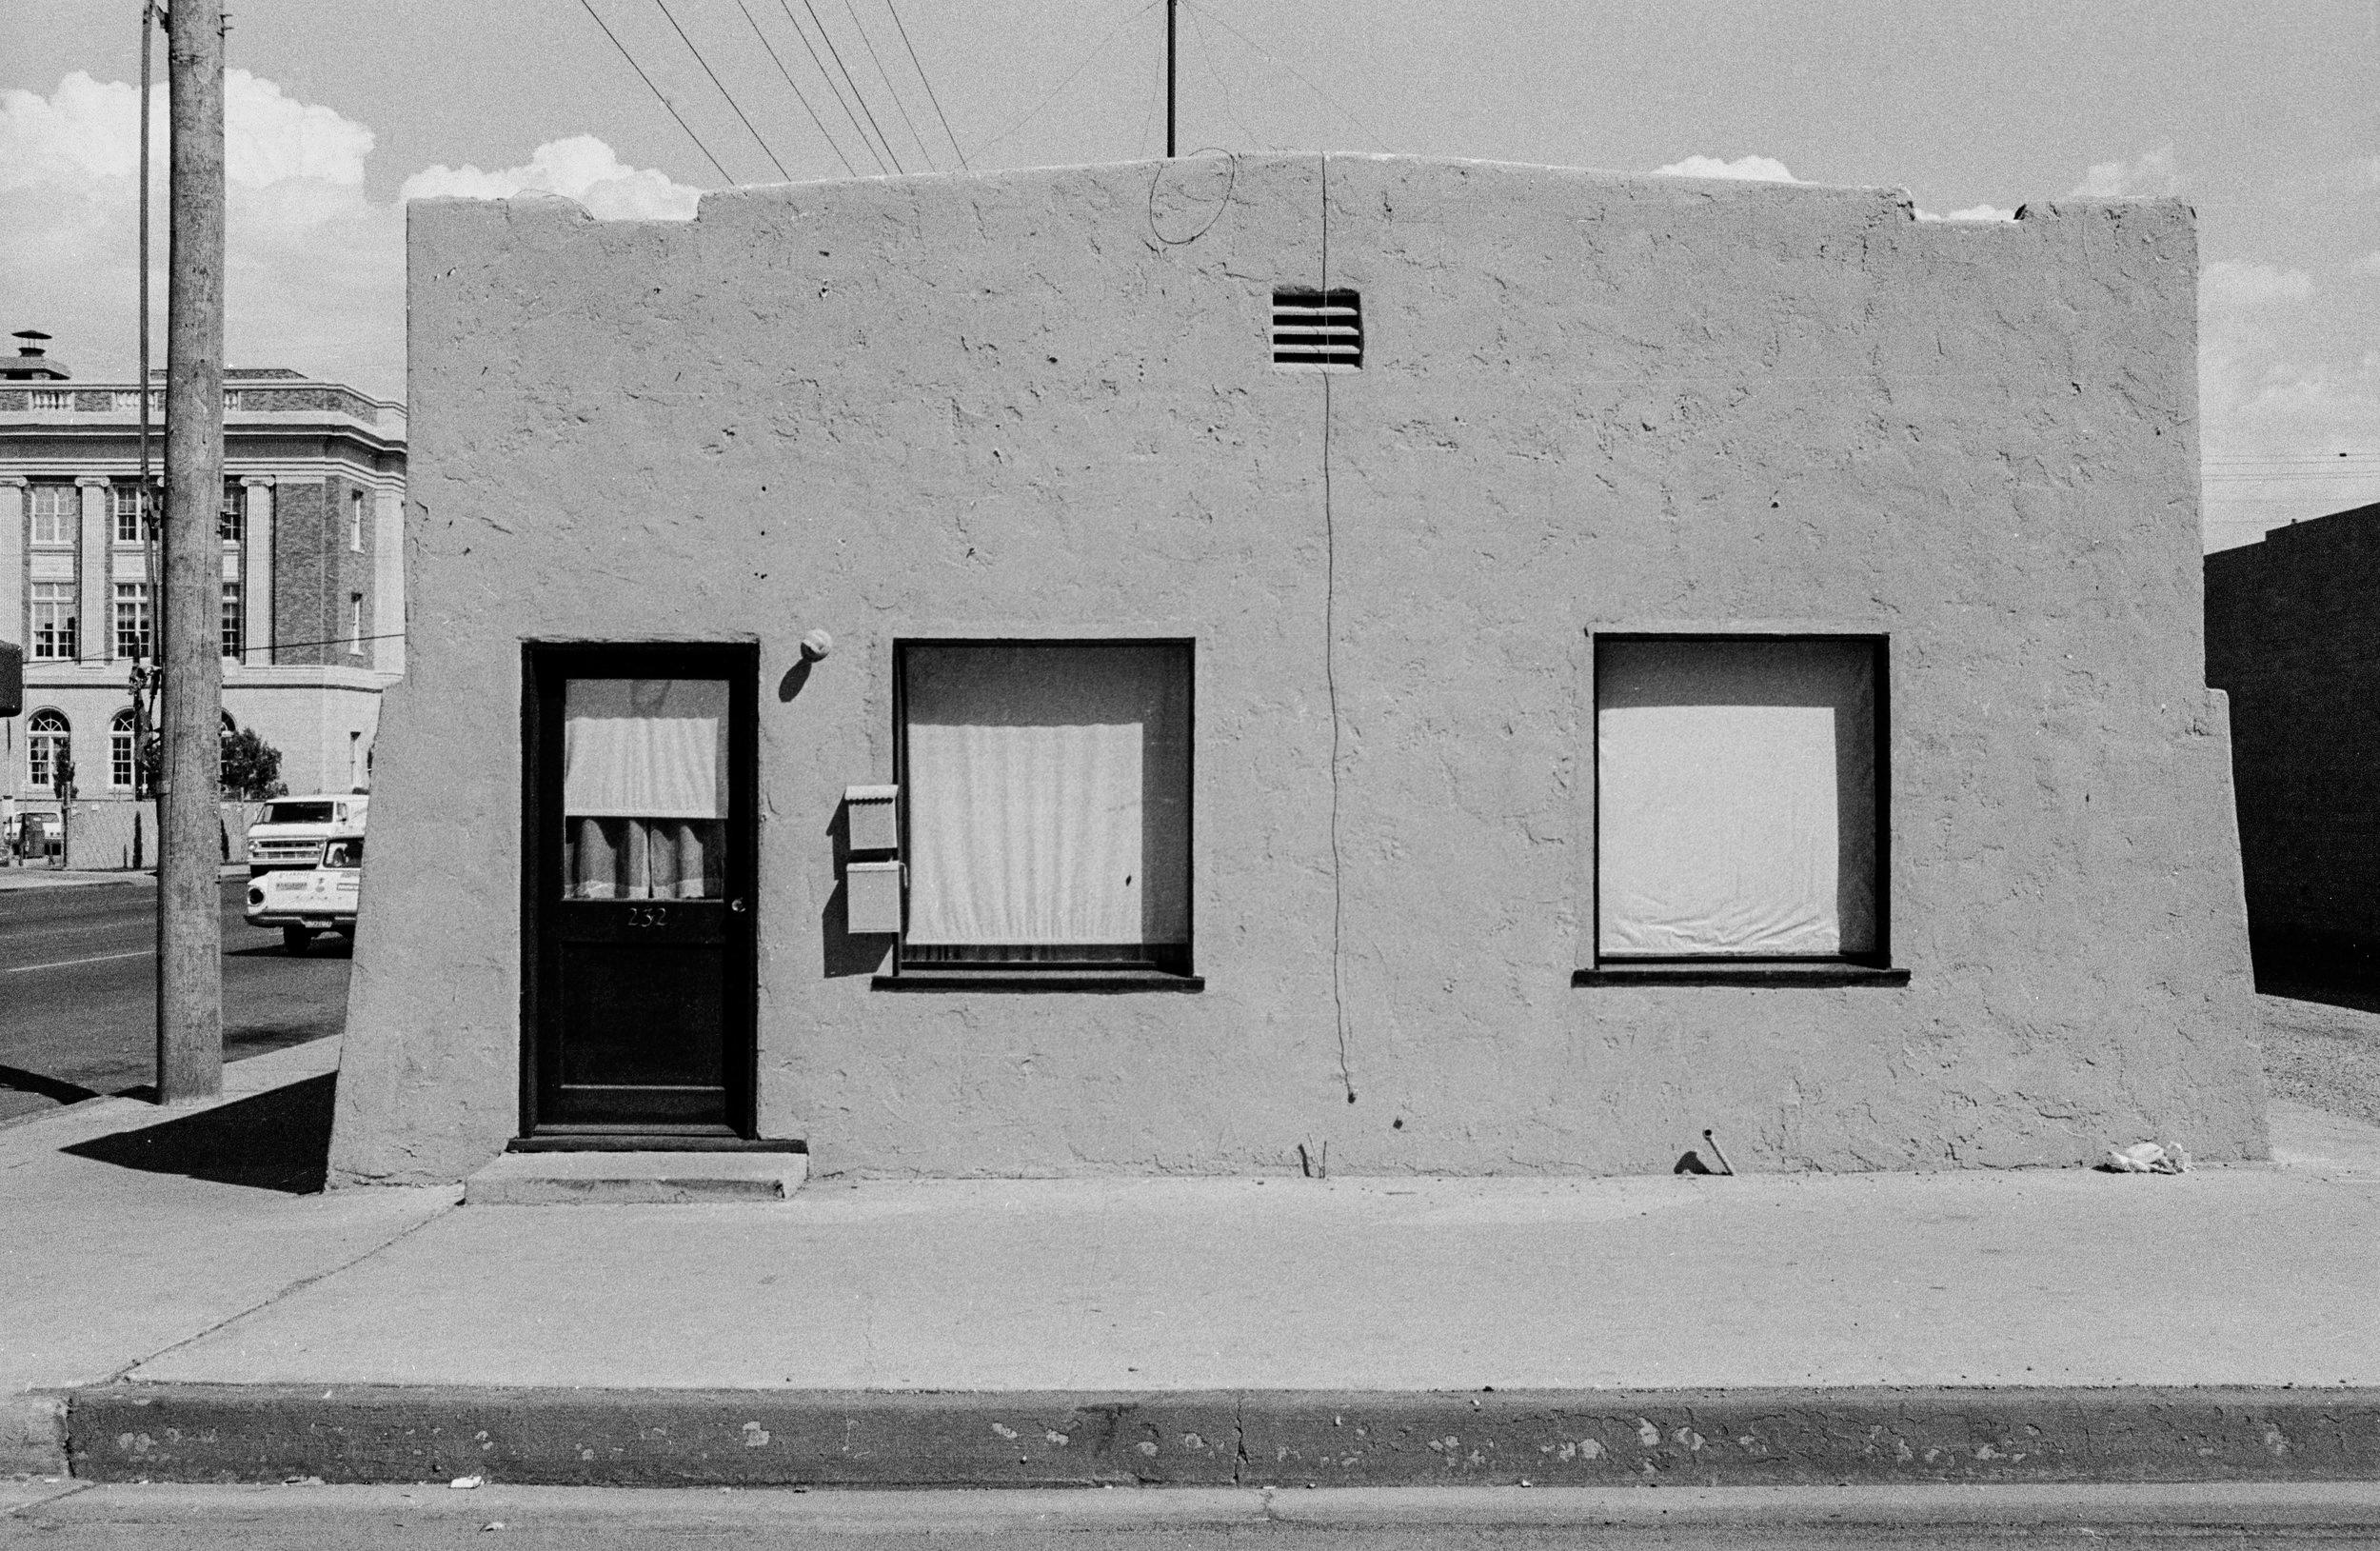 Las Vegas, NV, 1975